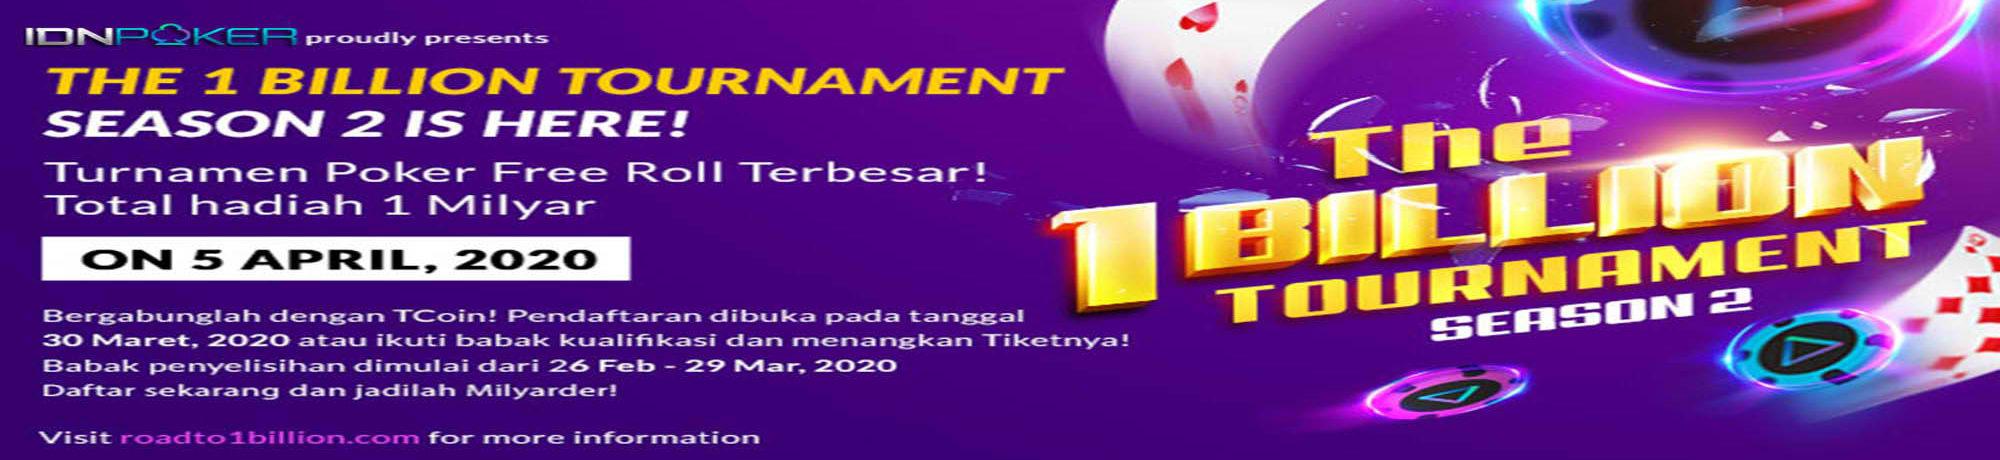 season idn poker 2